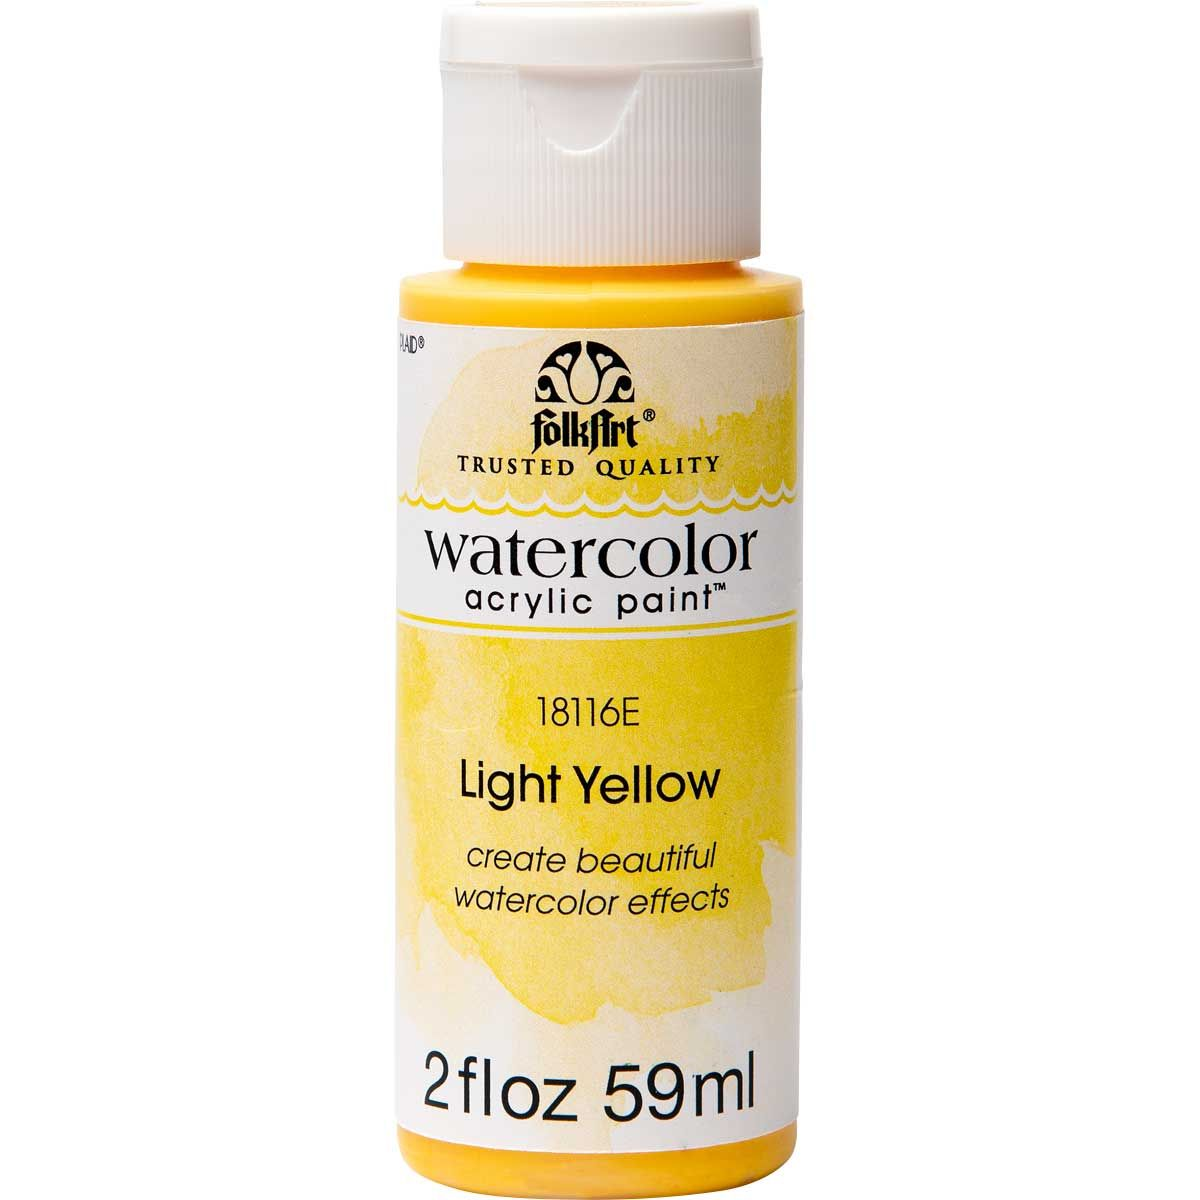 Folkart Watercolor Acrylic Paint Light Yellow 2 Oz